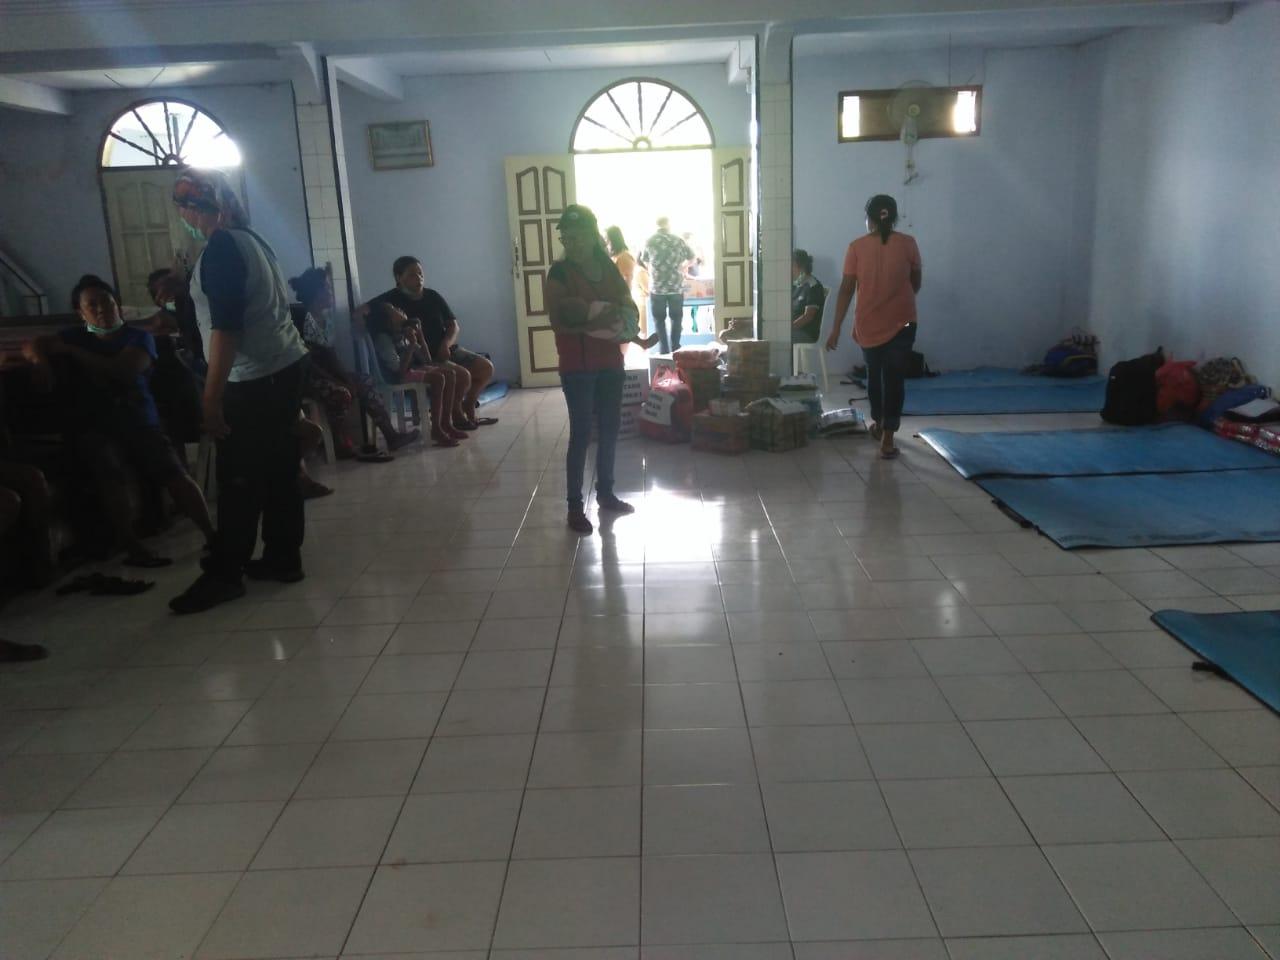 112 Warga yang Diungsikan, Pemerintah Daerah Salurkan Bantuan Dua Minggu Kedepan